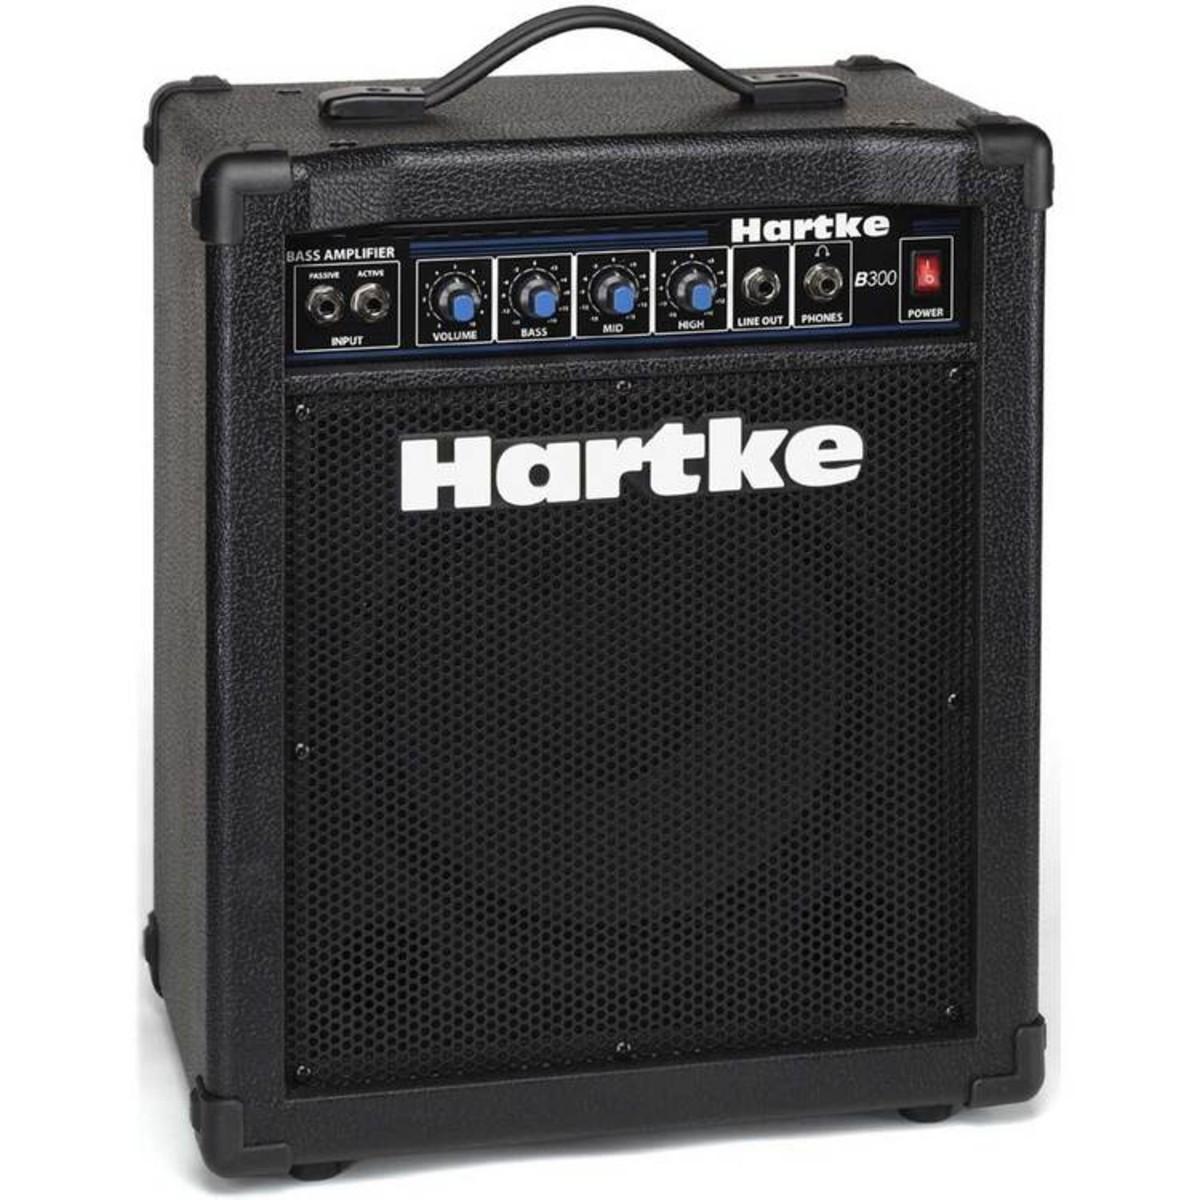 hartke b300 30w bass amp combo at. Black Bedroom Furniture Sets. Home Design Ideas